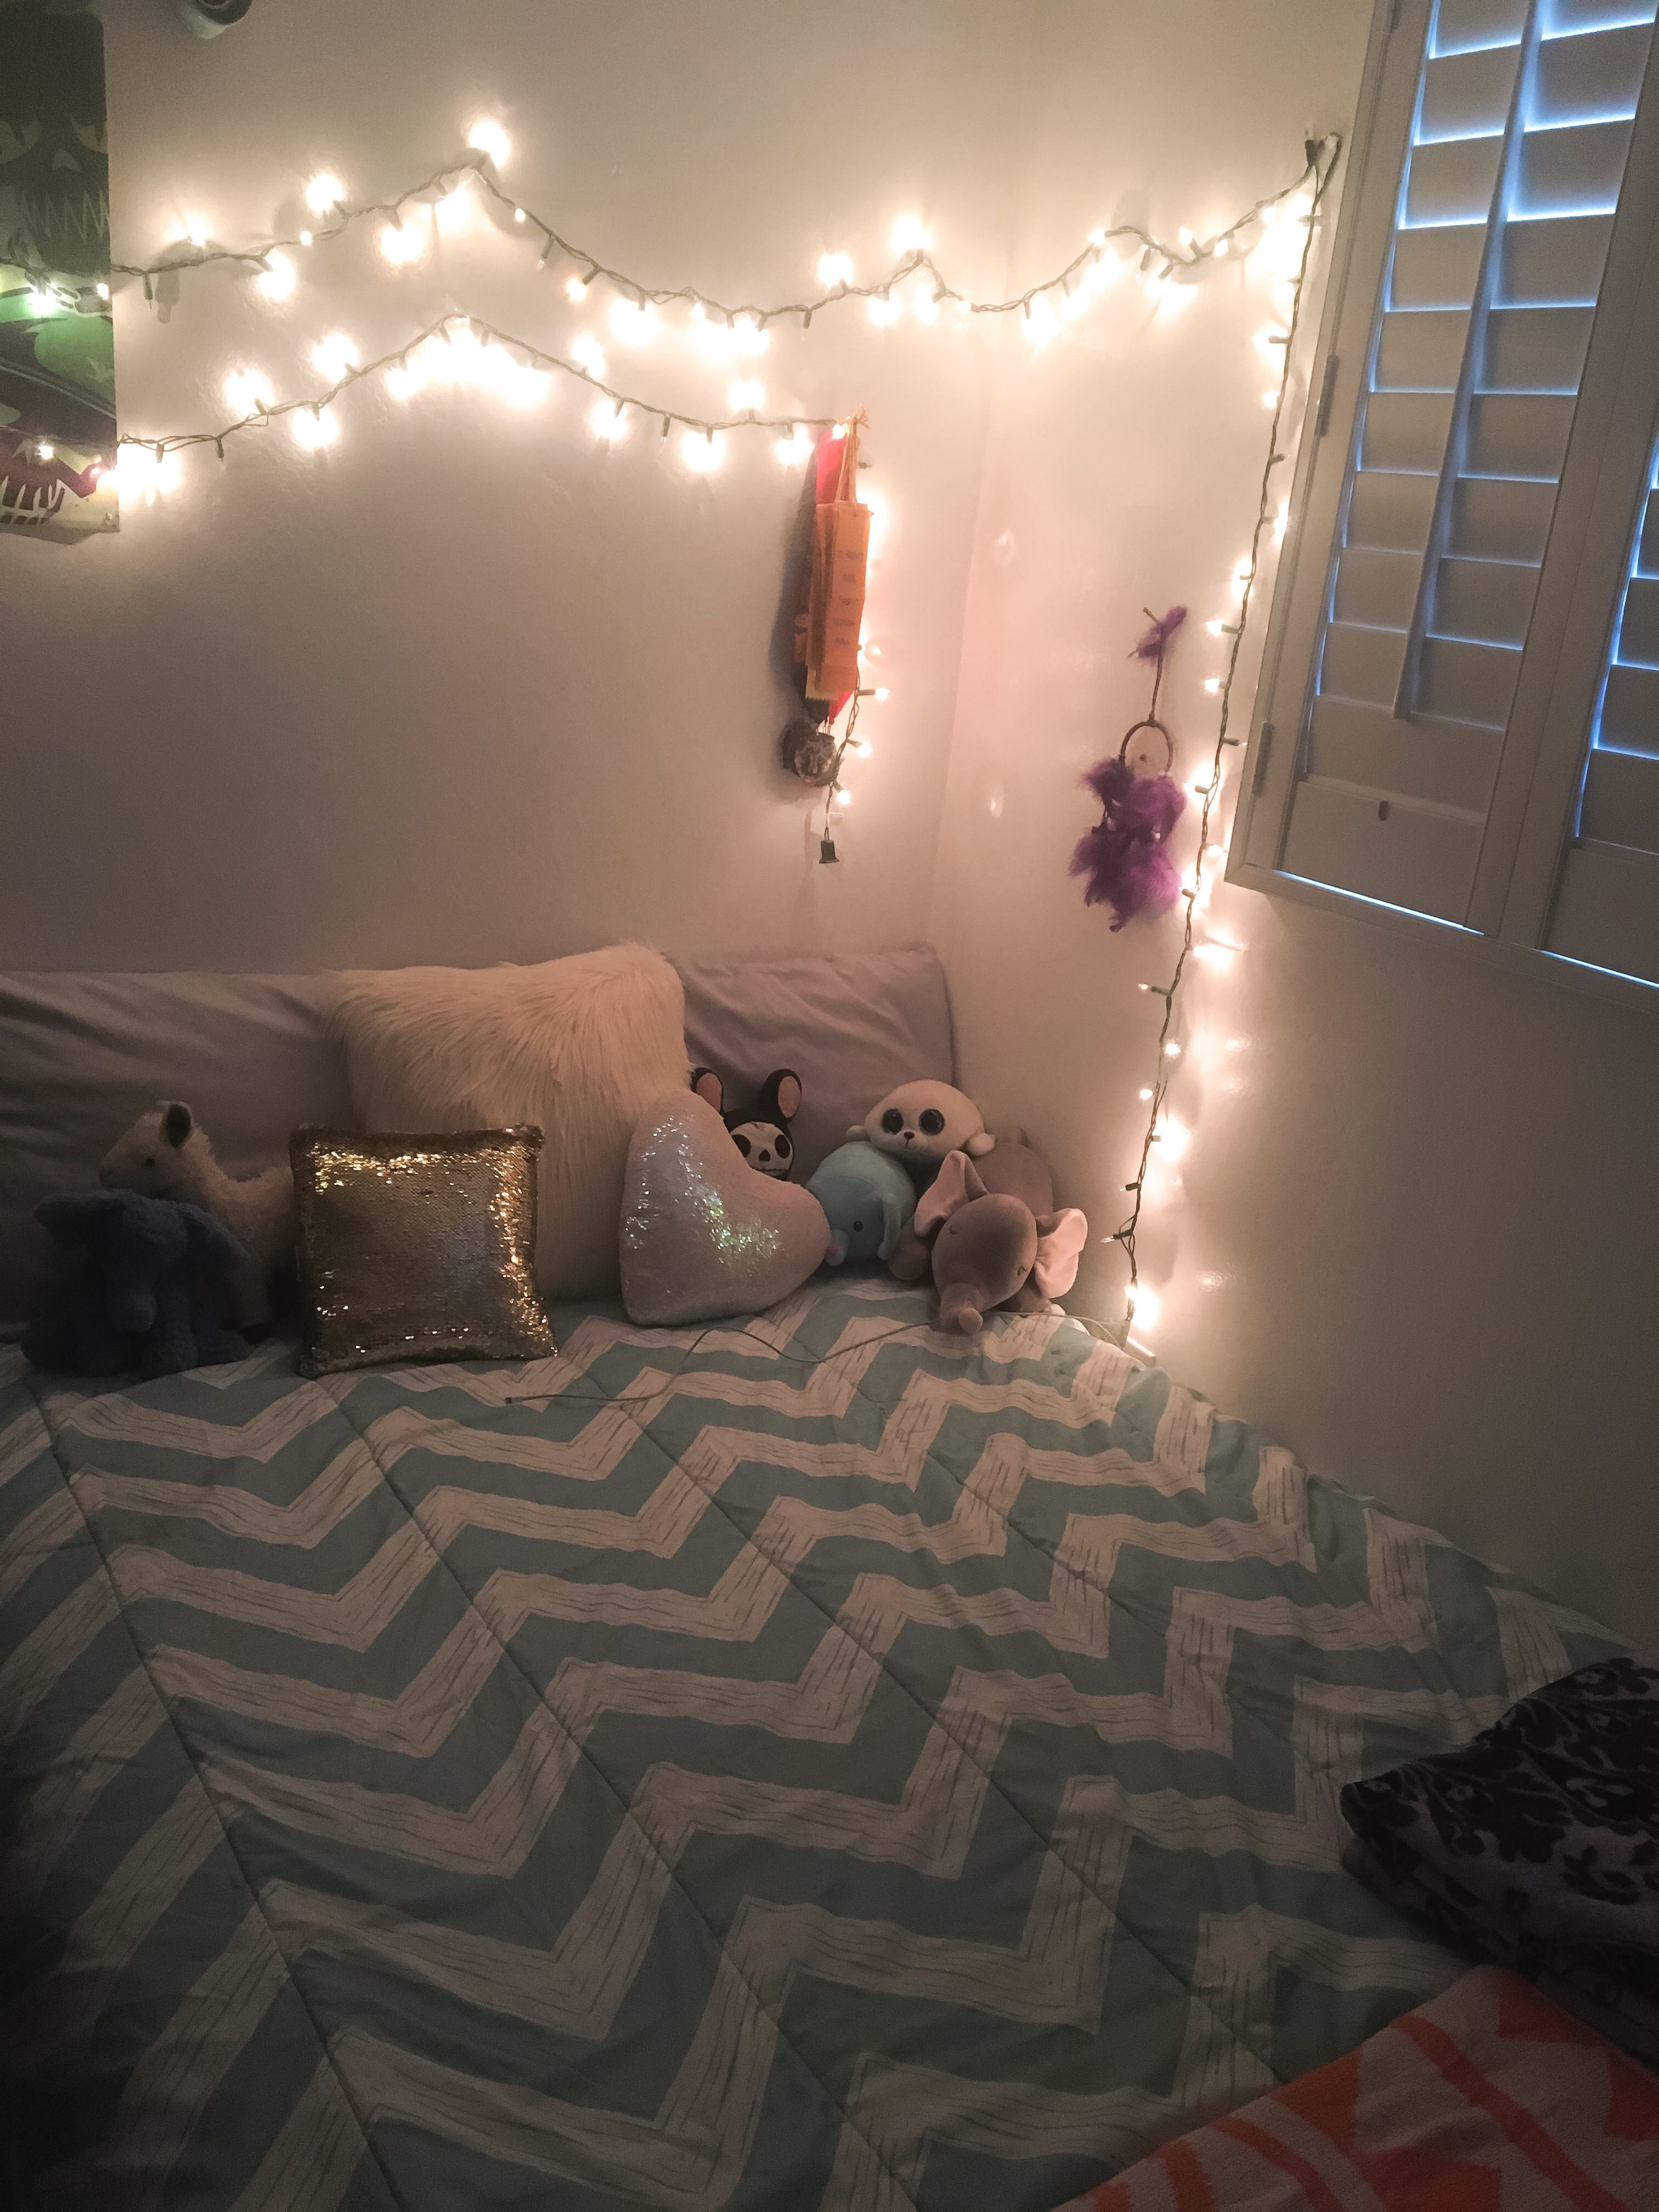 tumblr fairy light teen room room ideas in 2018 pinterest room rh pinterest com